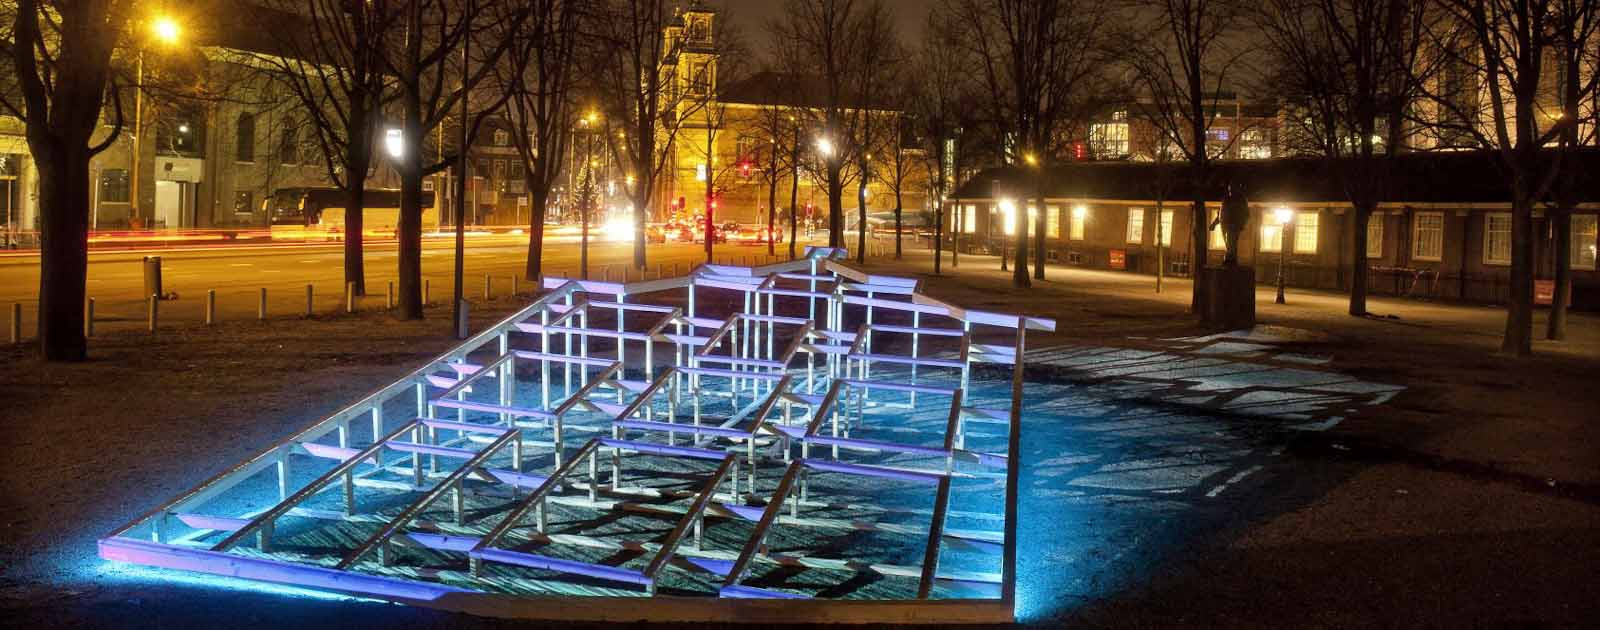 Bekijk kunstwerken Amsterdam light festival